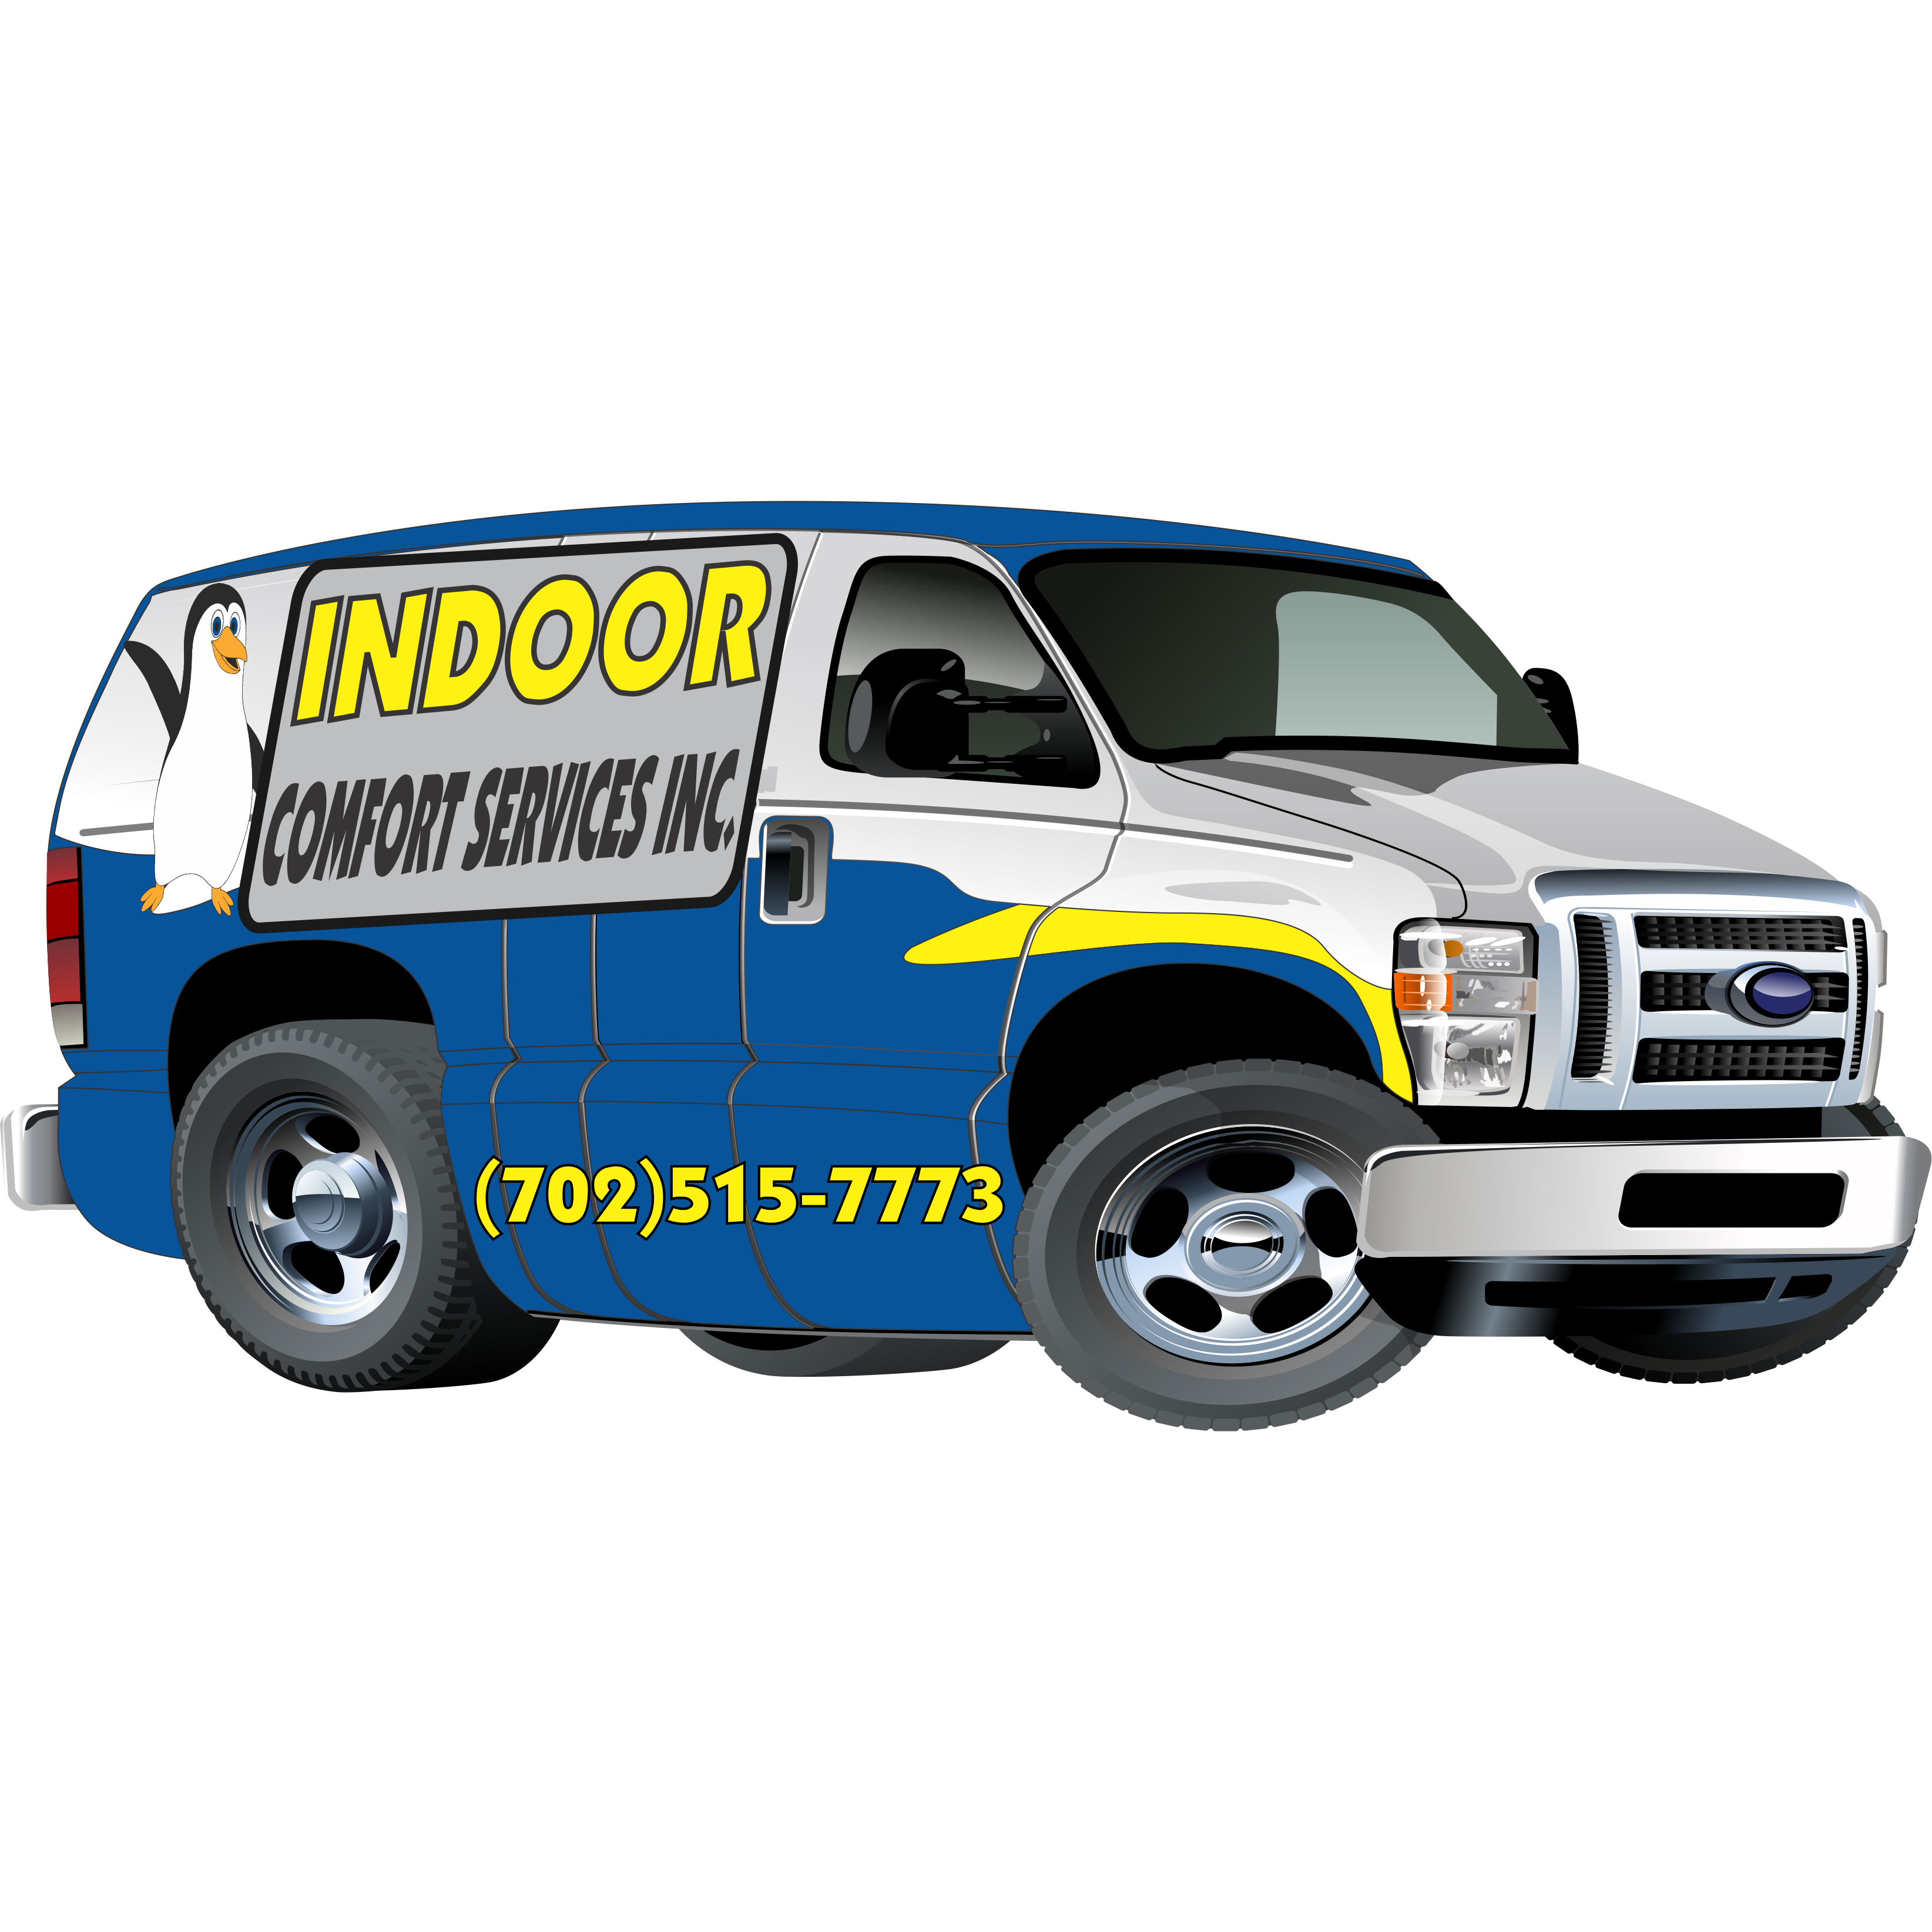 Indoor Comfort Services Inc - las vegas, NV - Heating & Air Conditioning